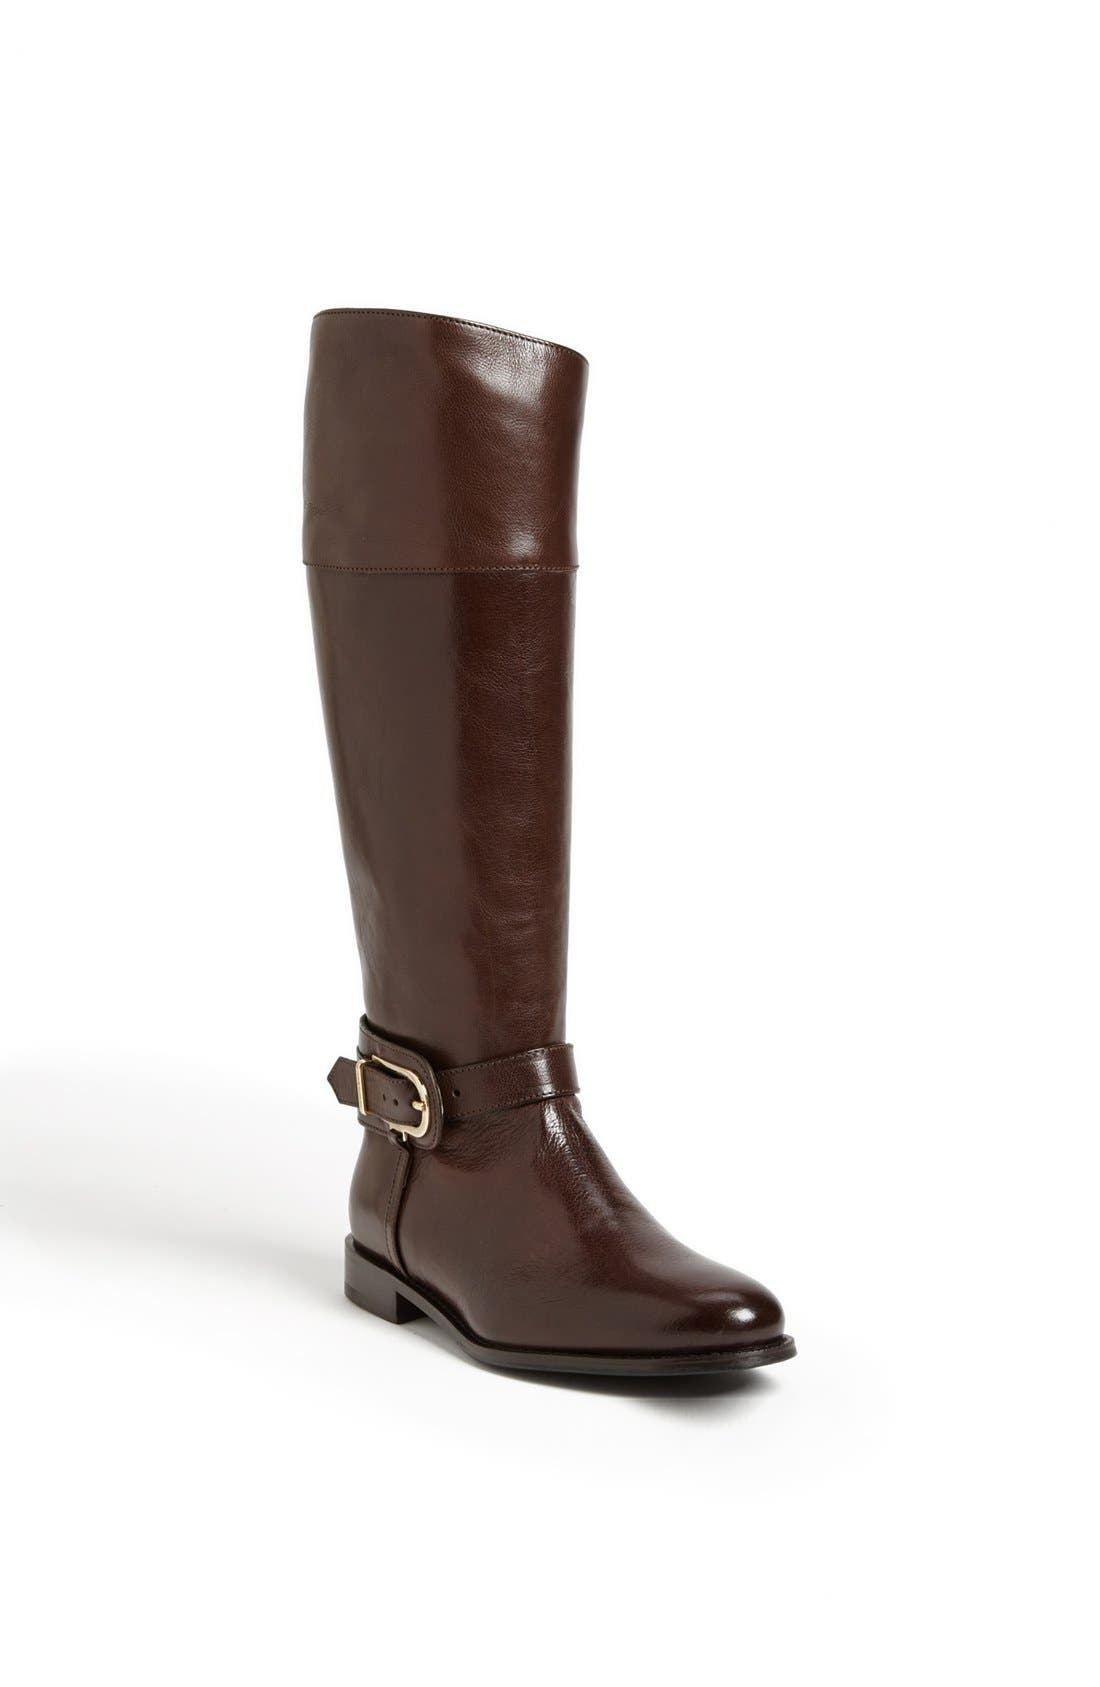 Main Image - Burberry 'Winton' Riding Boot